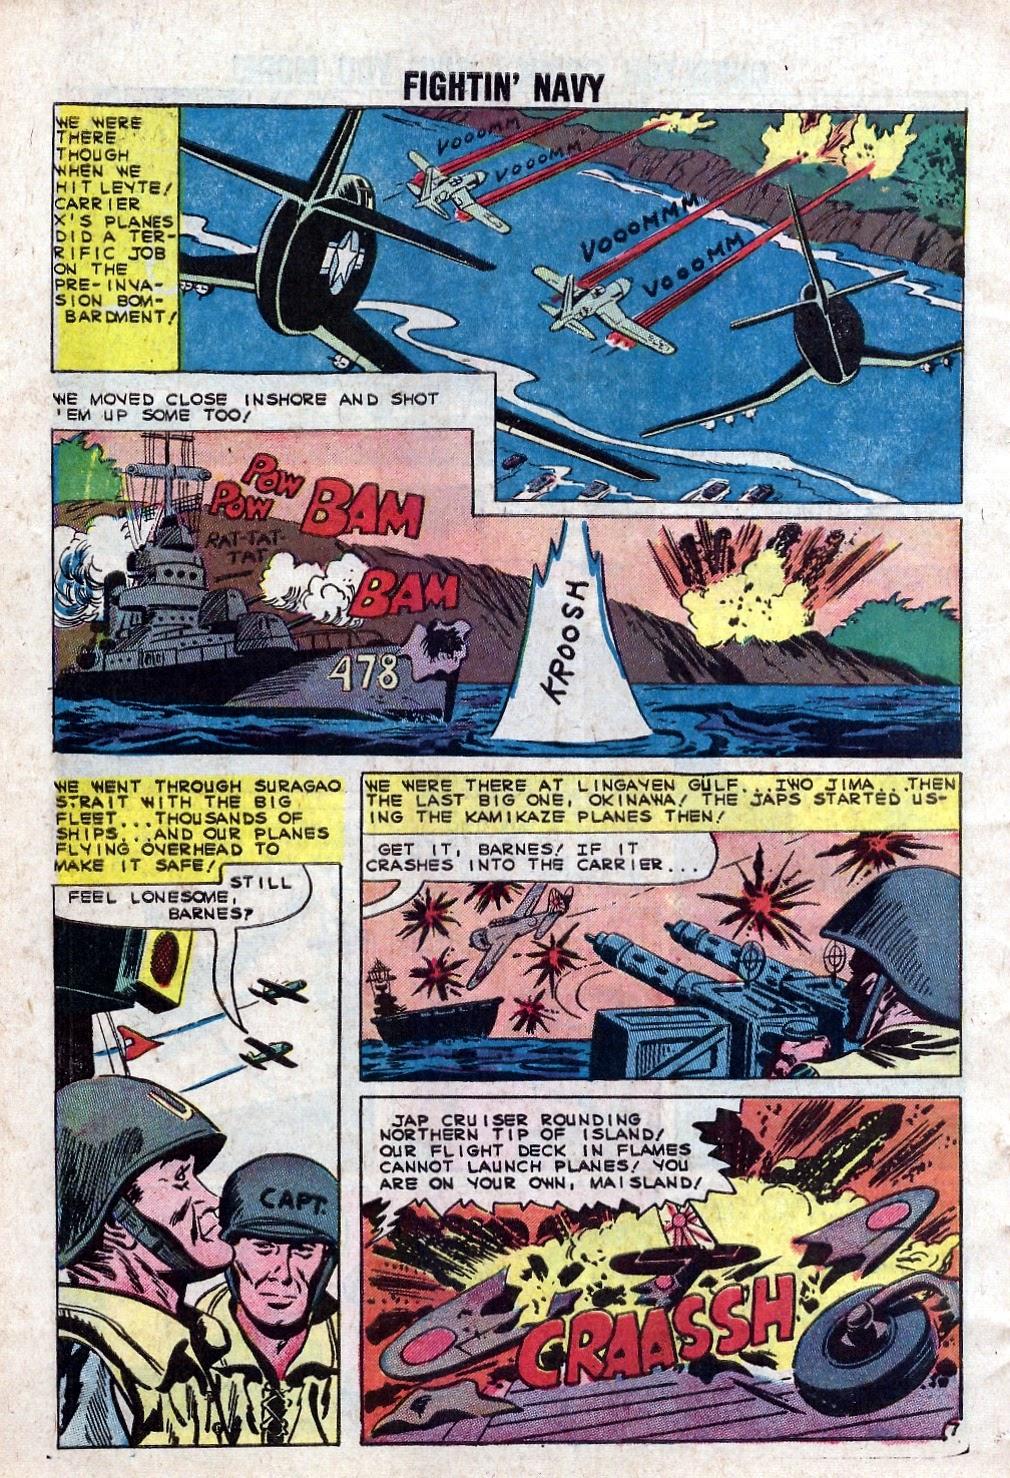 Read online Fightin' Navy comic -  Issue #94 - 10